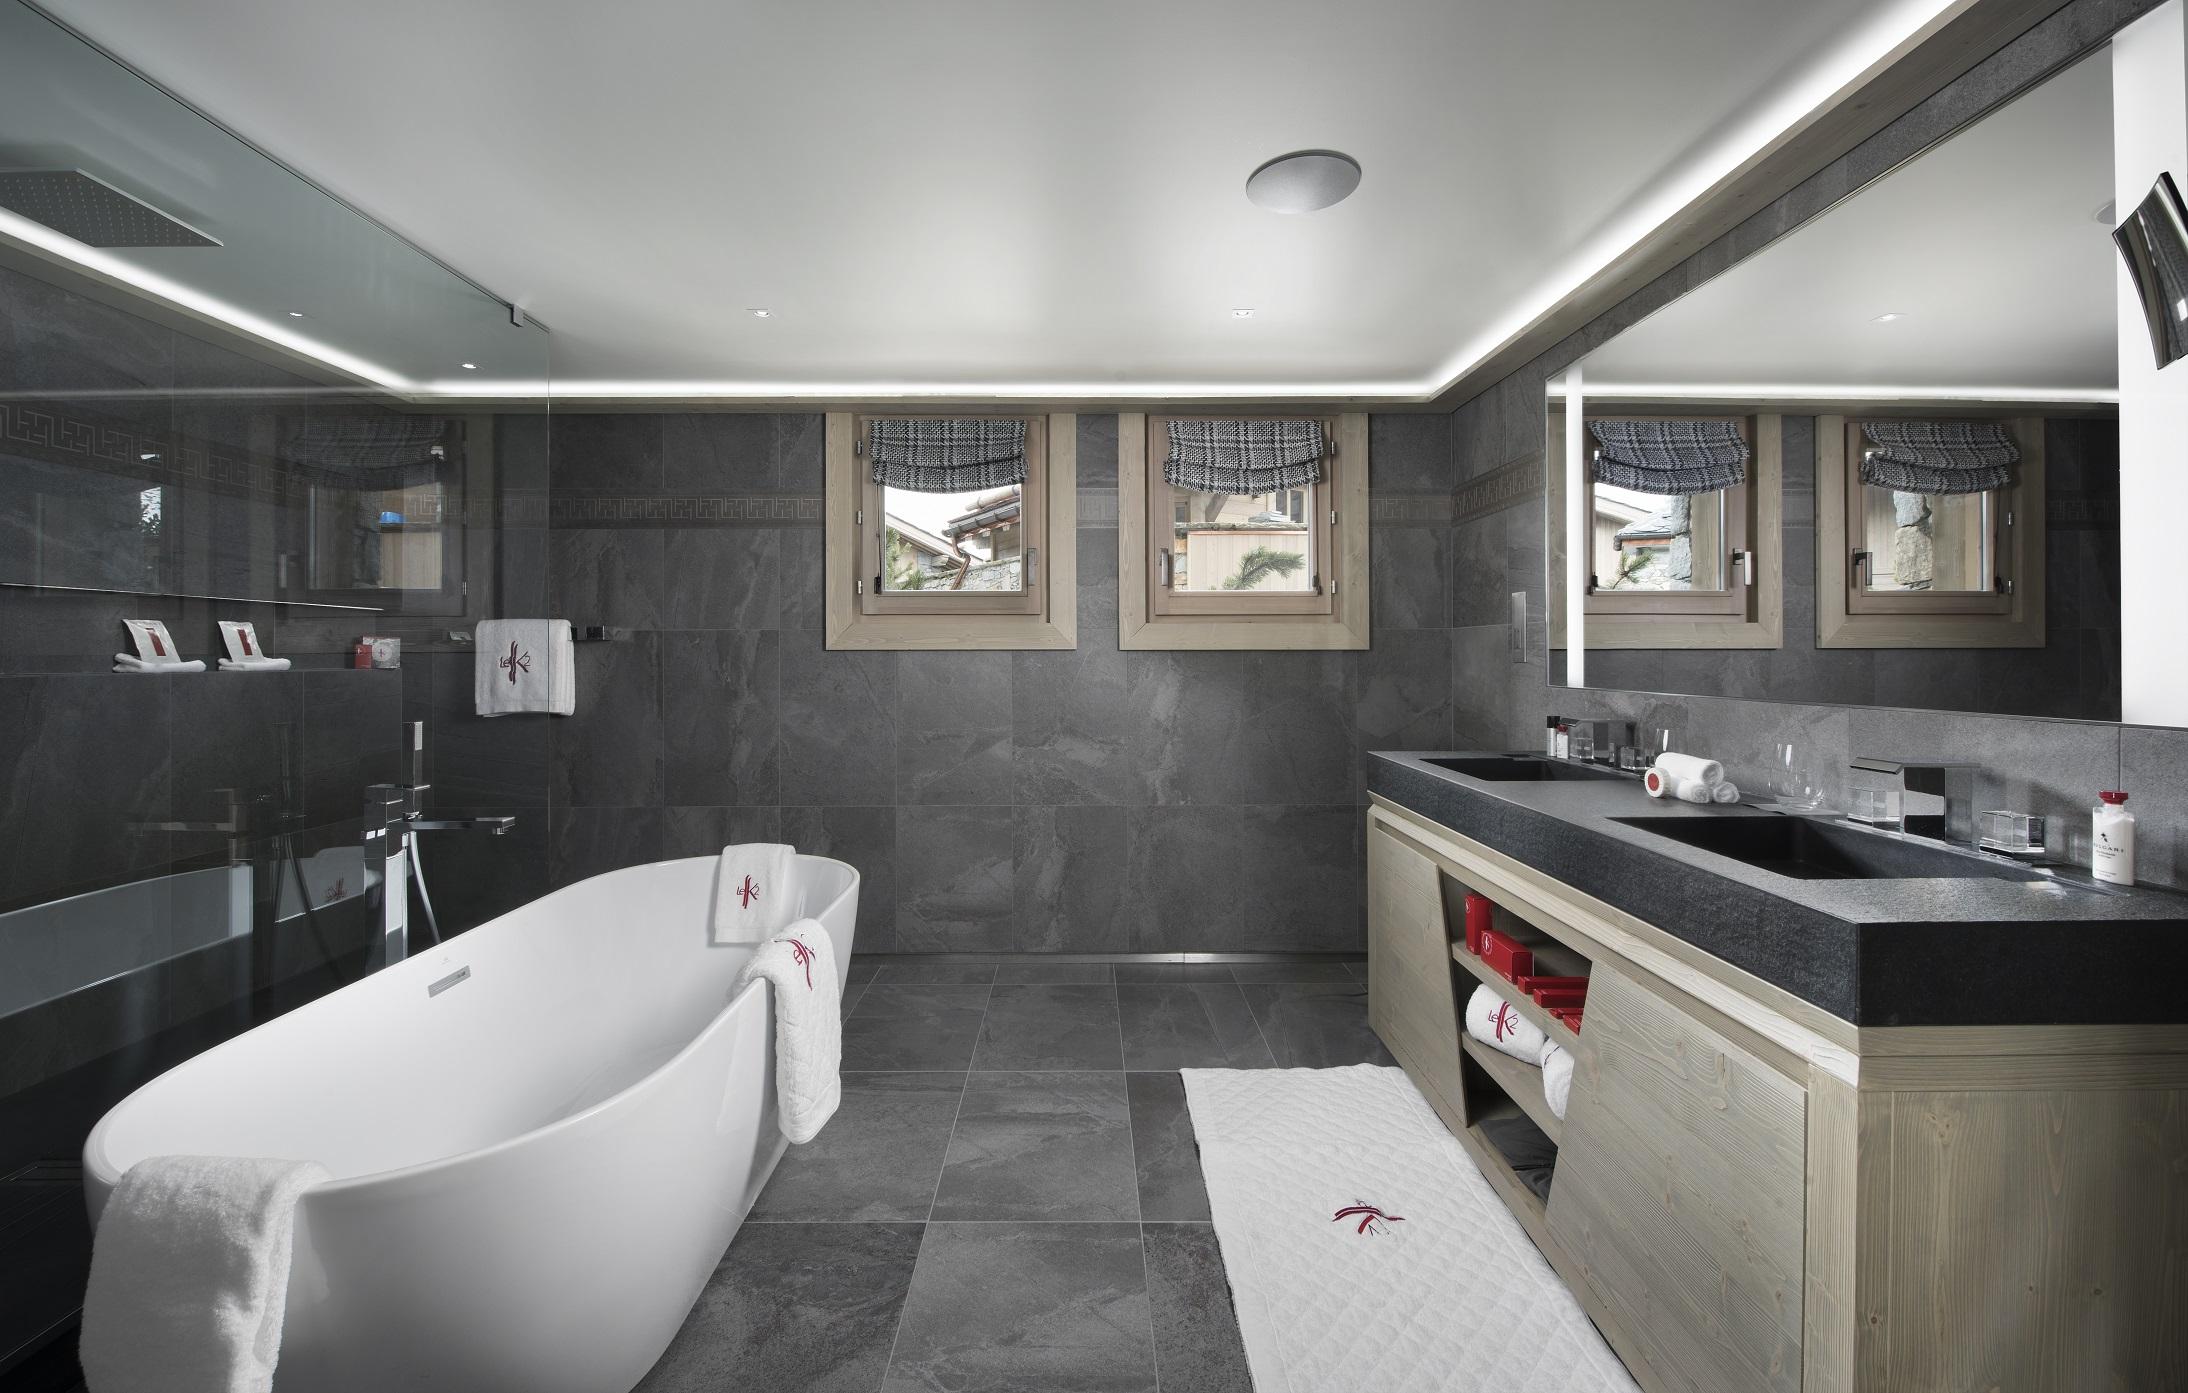 07 Bathroom-2.jpg